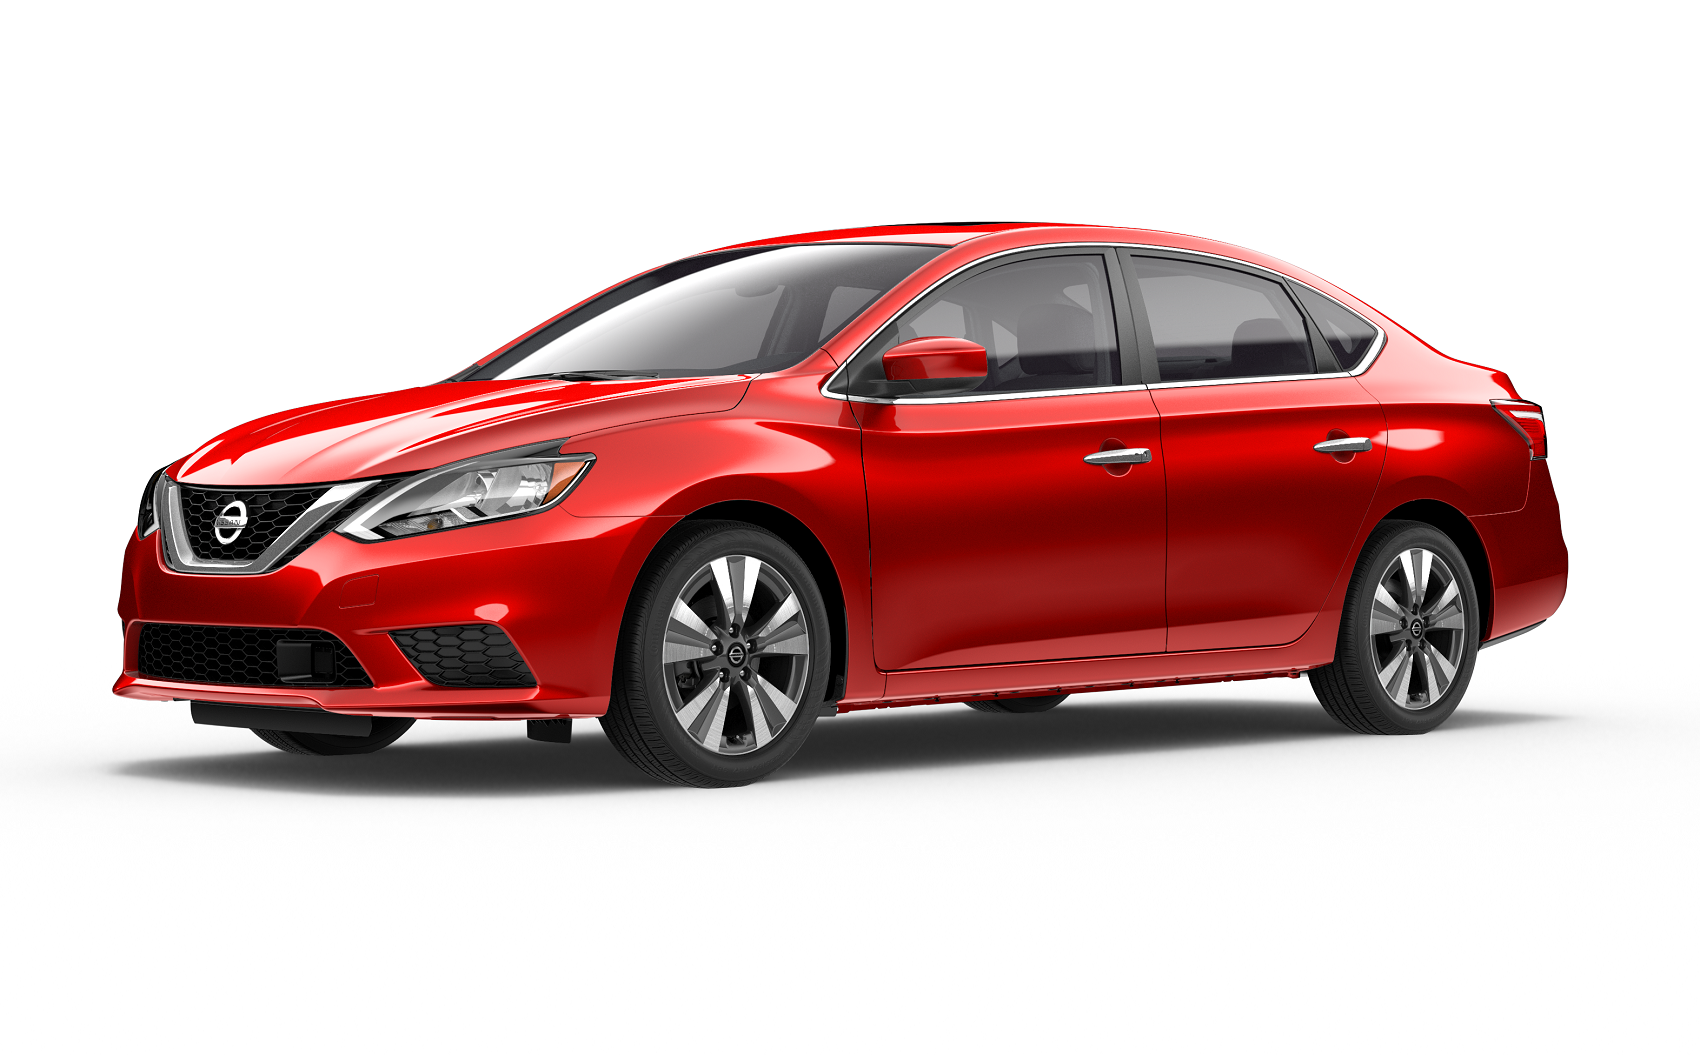 Nissan Sentra Red